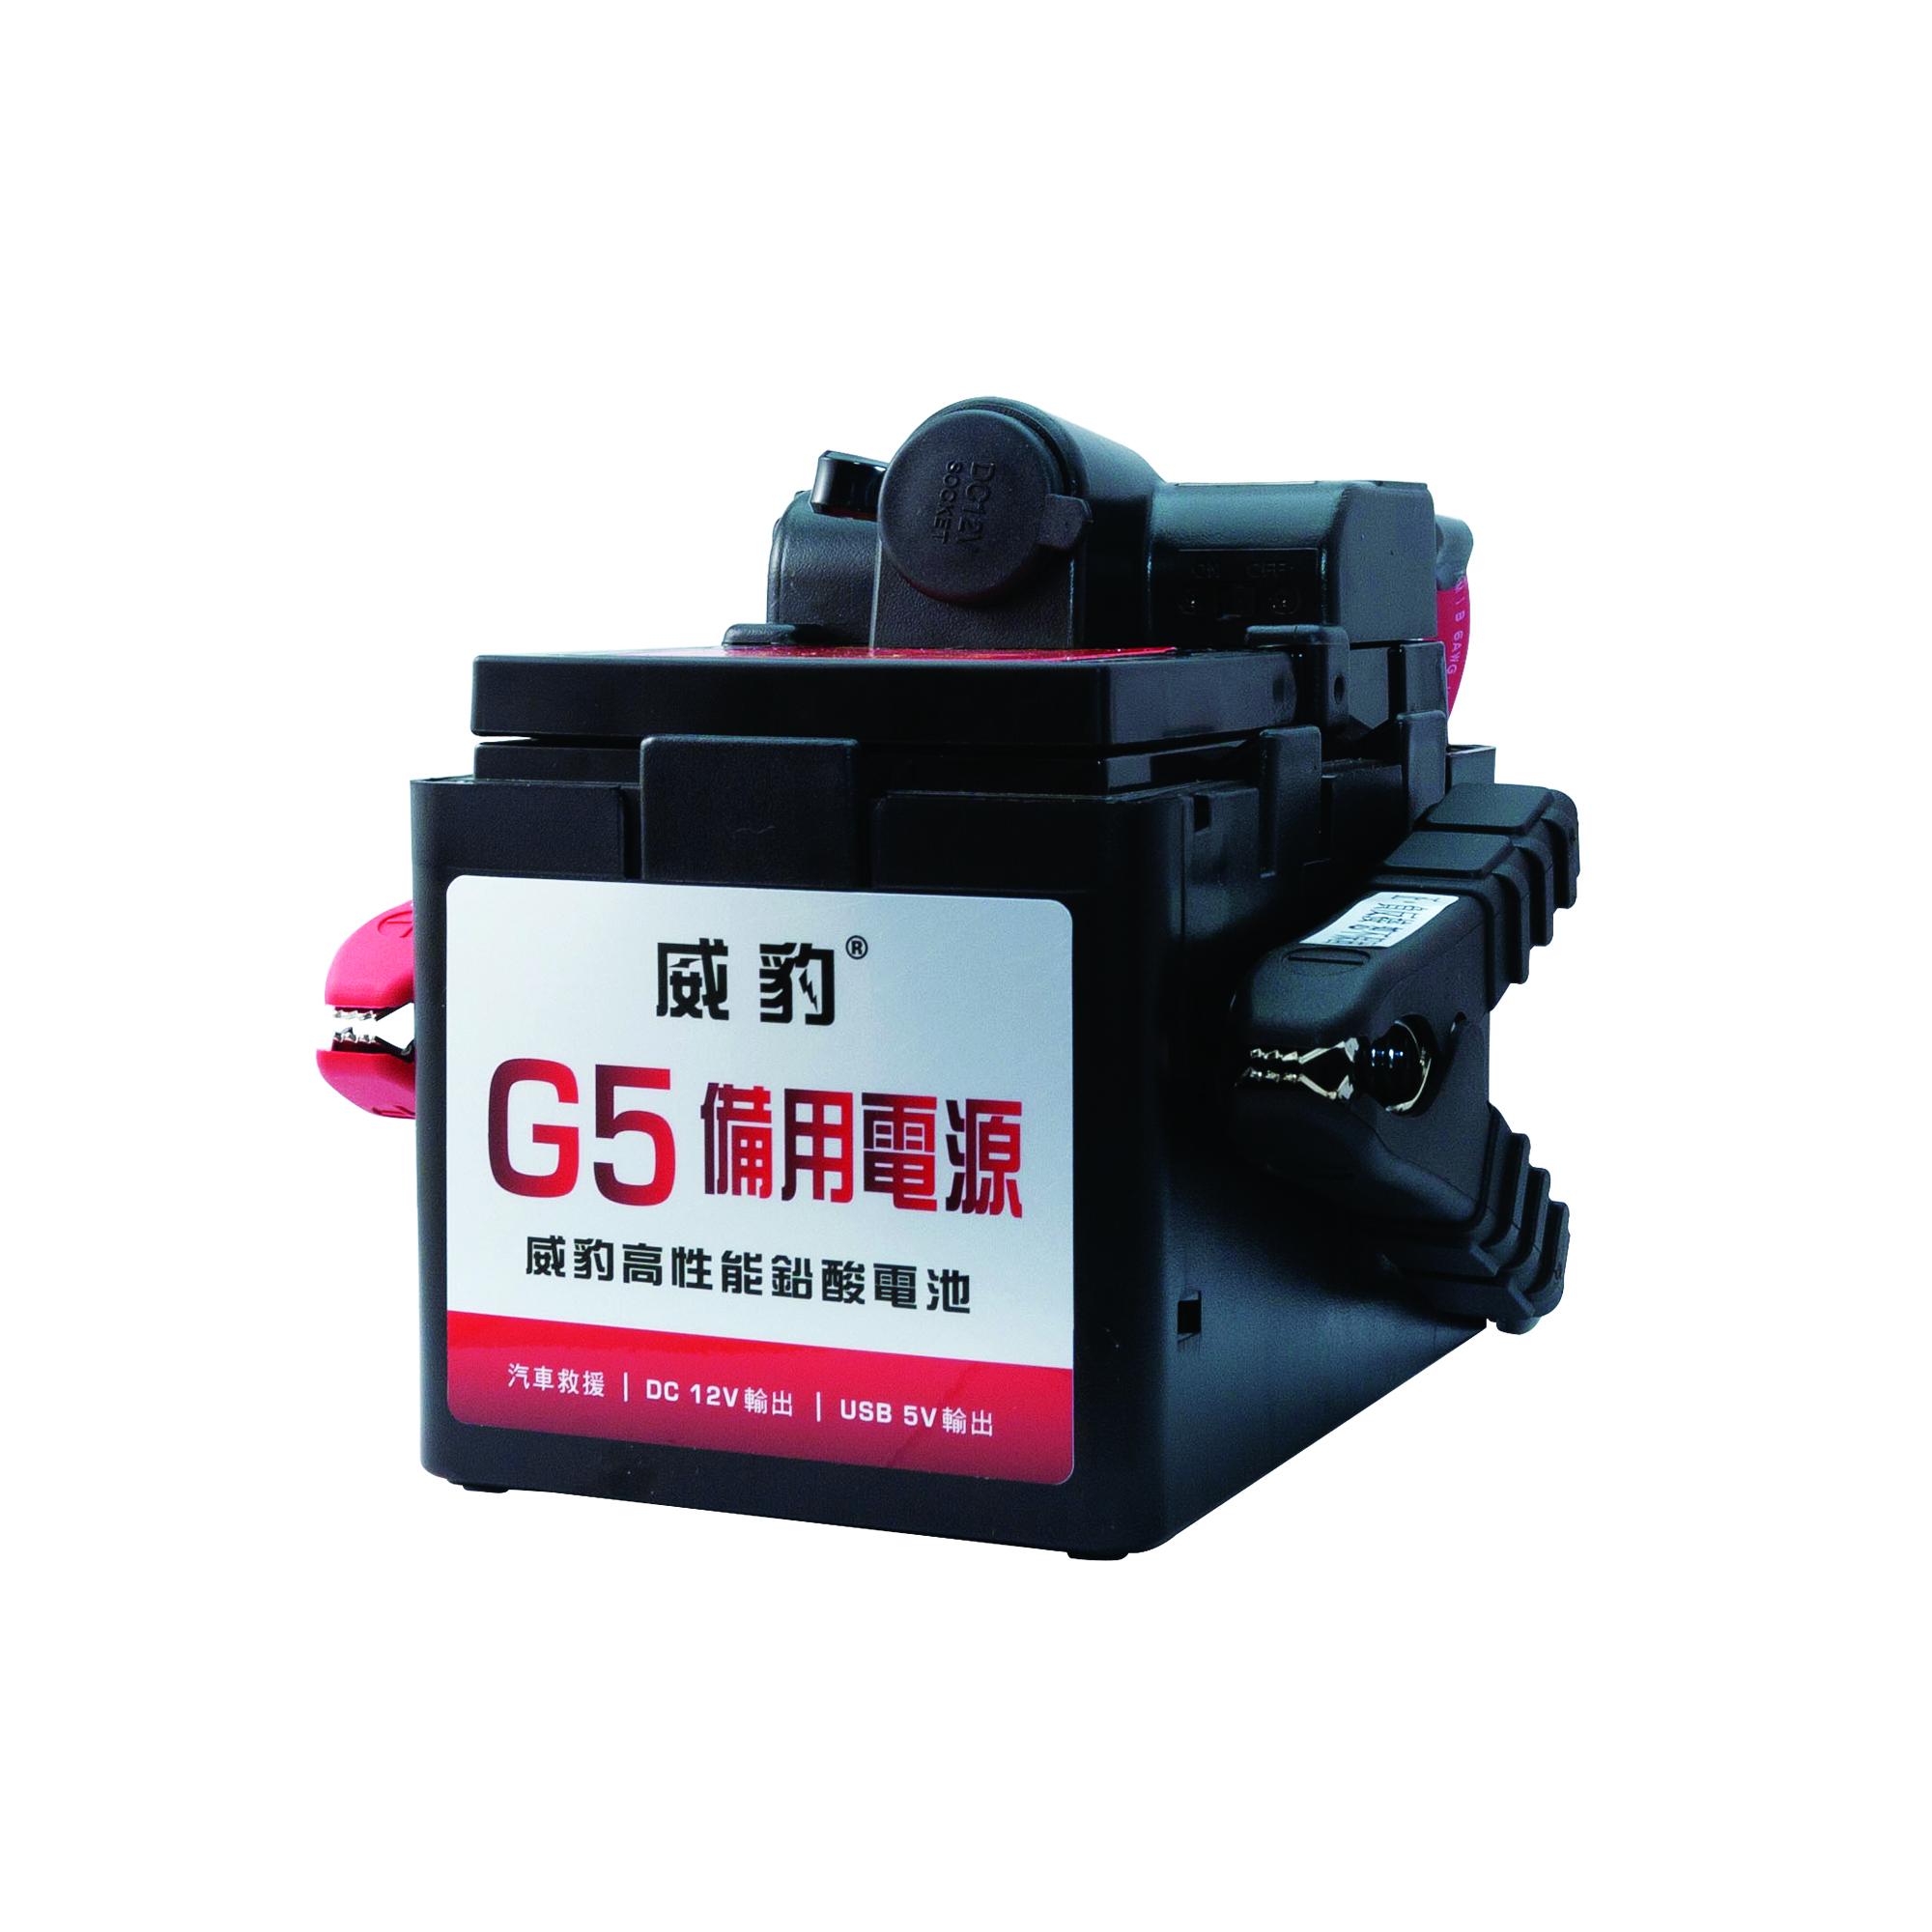 G5E01 Super Mini Booster/Jump Starter/Emergency Car Starter